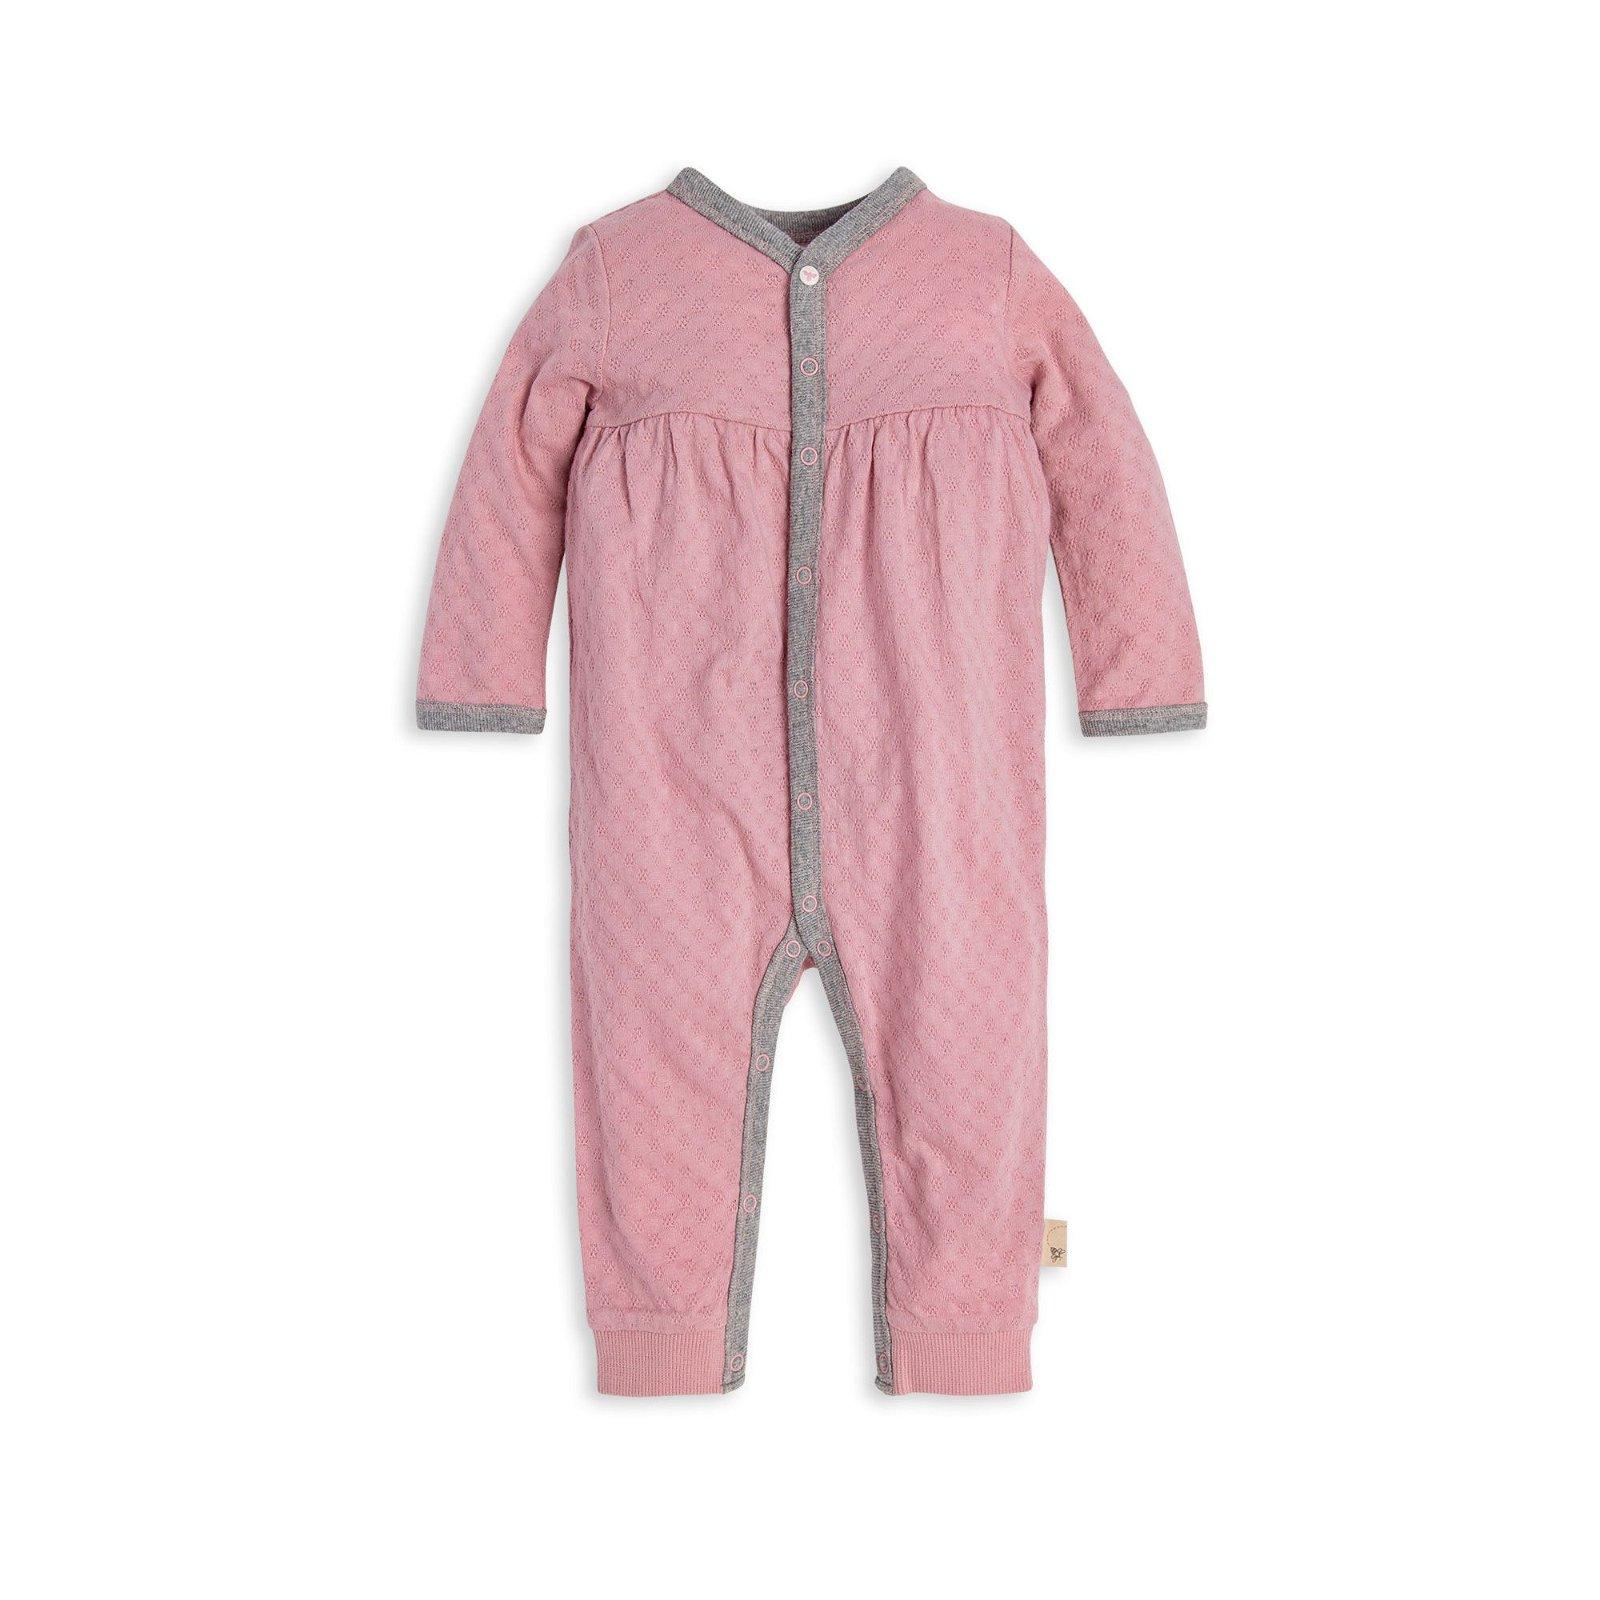 Honeycomb Pointelle Organic Baby Jumpsuit